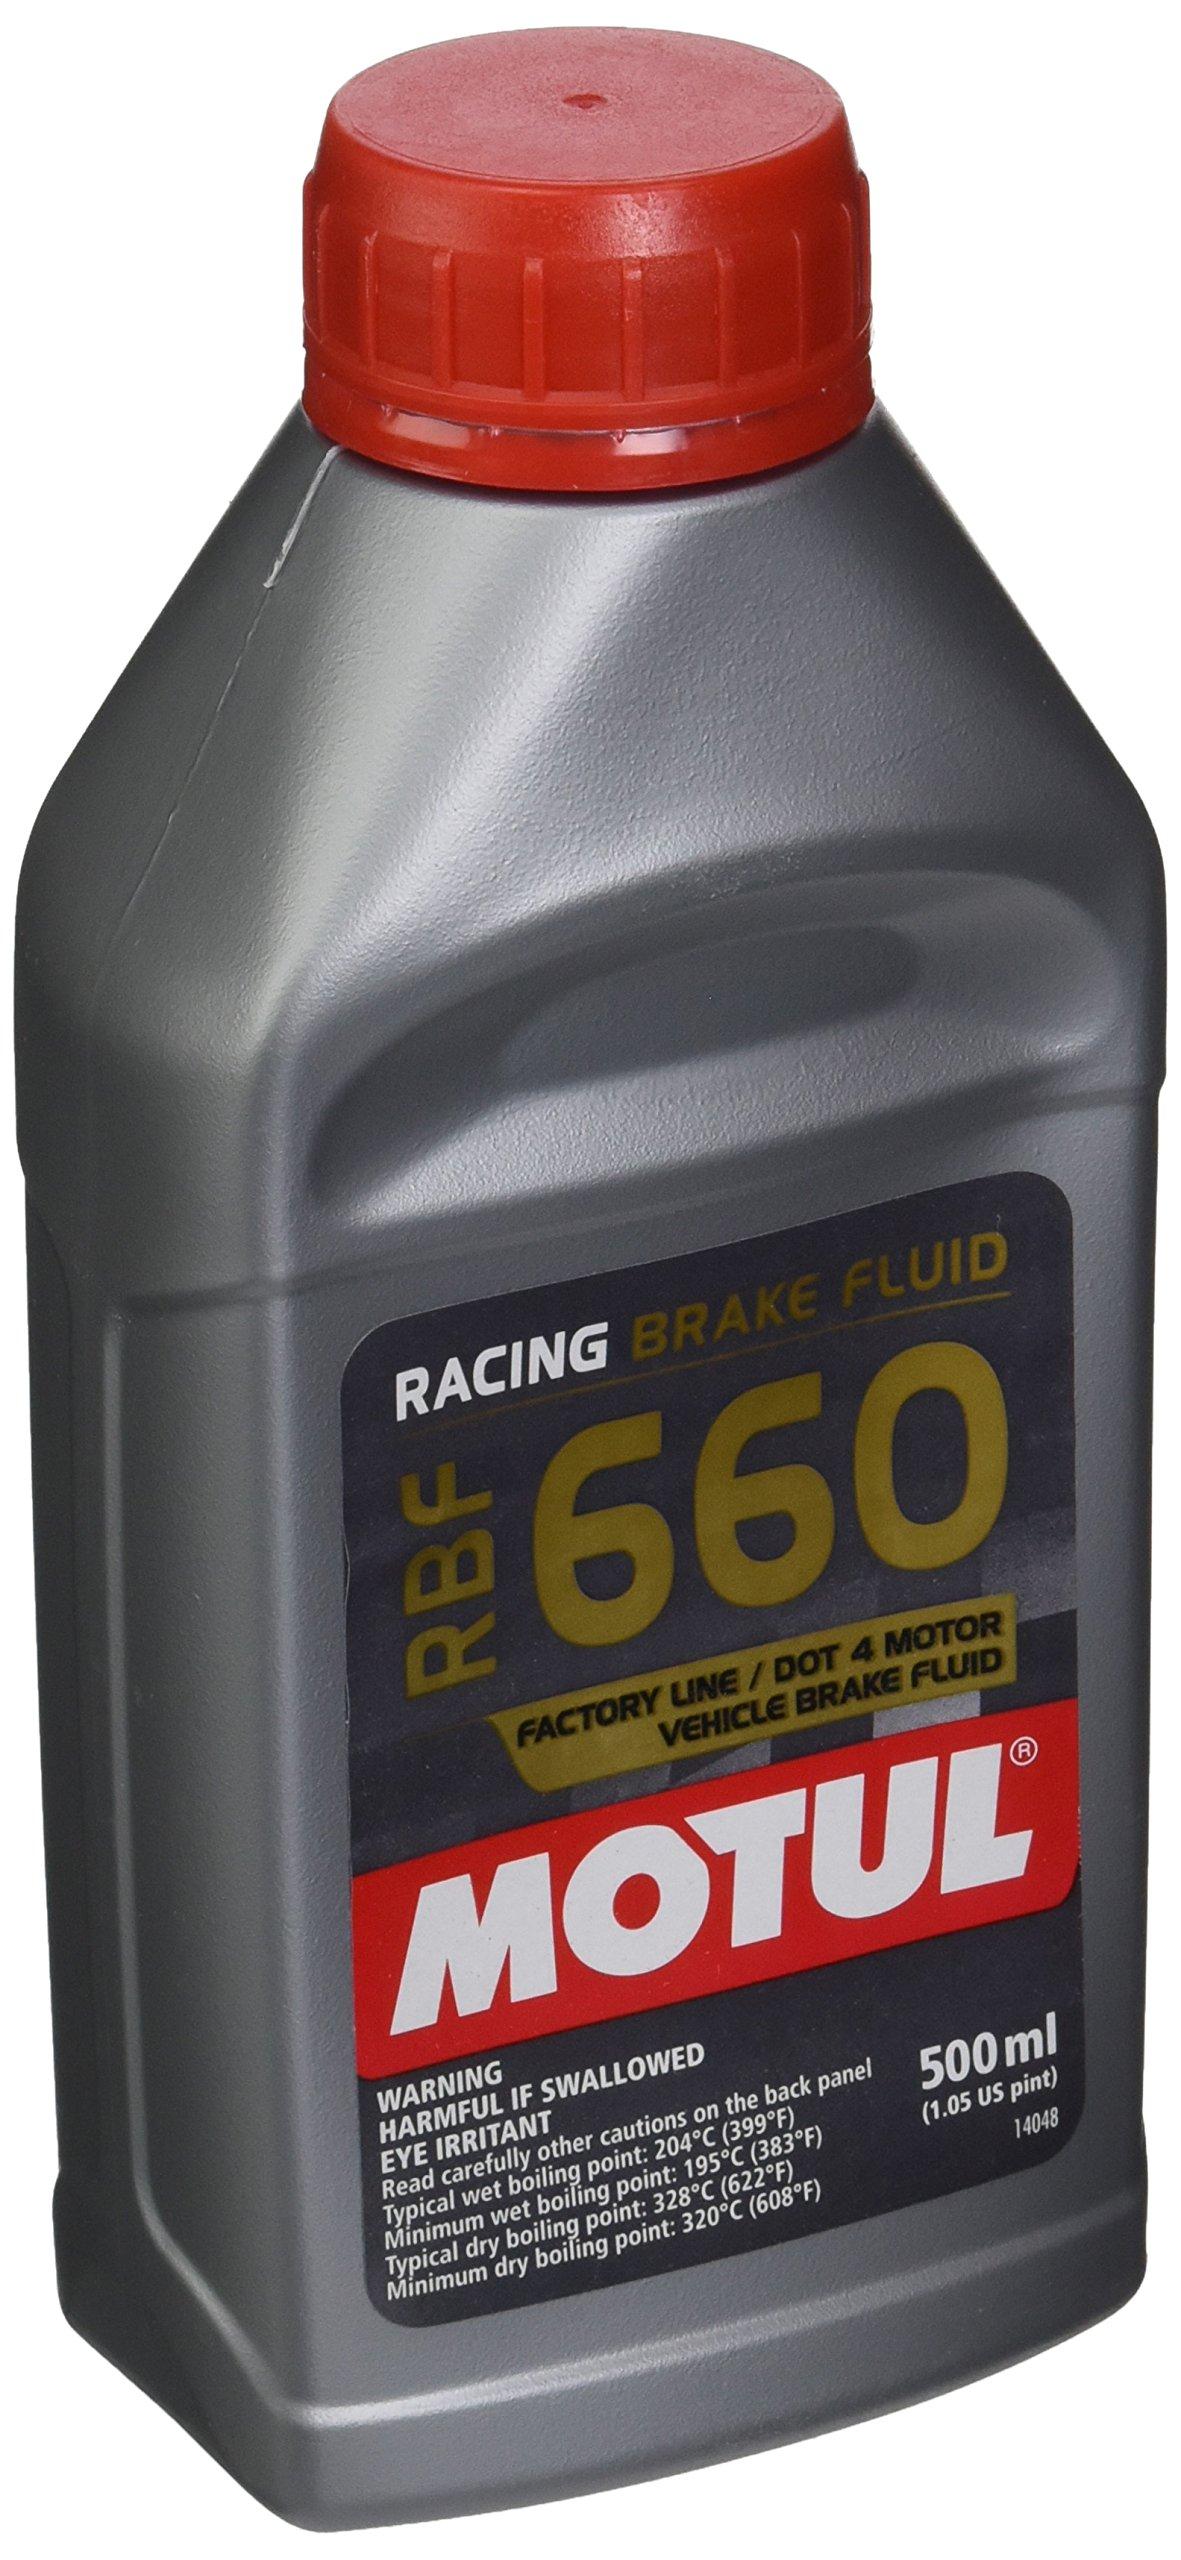 Motul 847205-12PK RBF 660 Factory Line Dot-4 100 Percent Synthetic Racing Brake Fluid - 500 ml, (Case Pack of 12)